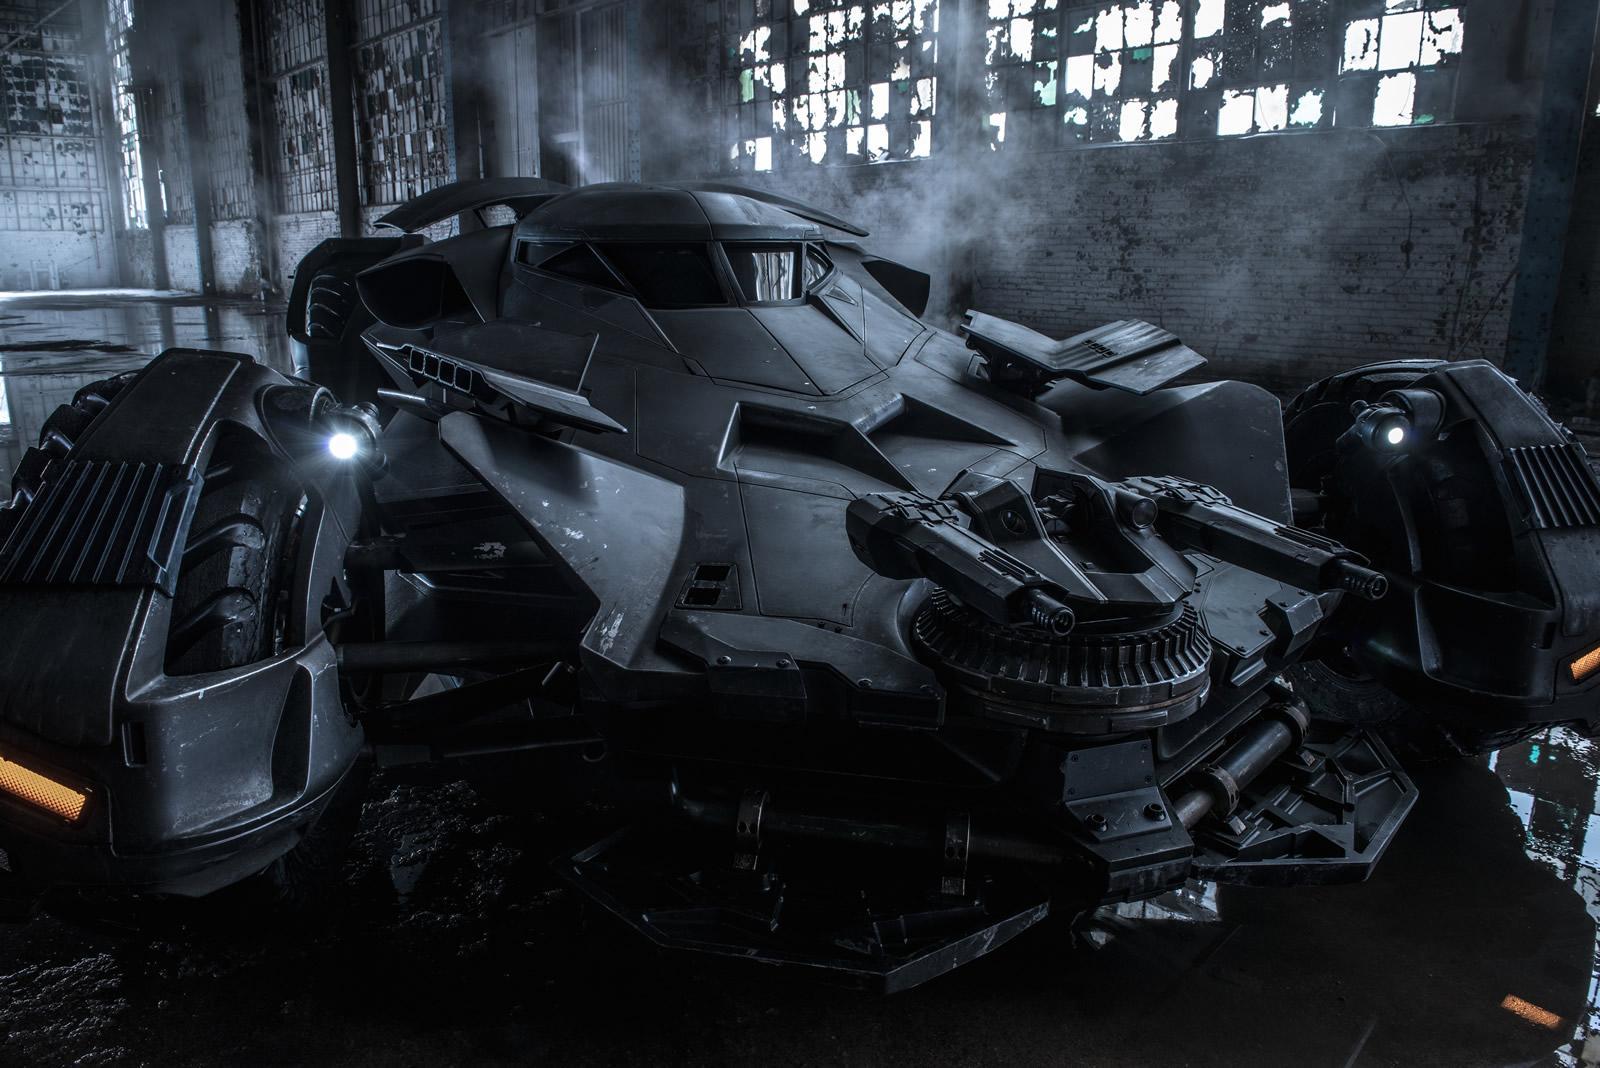 Superman V Batman Batmobile